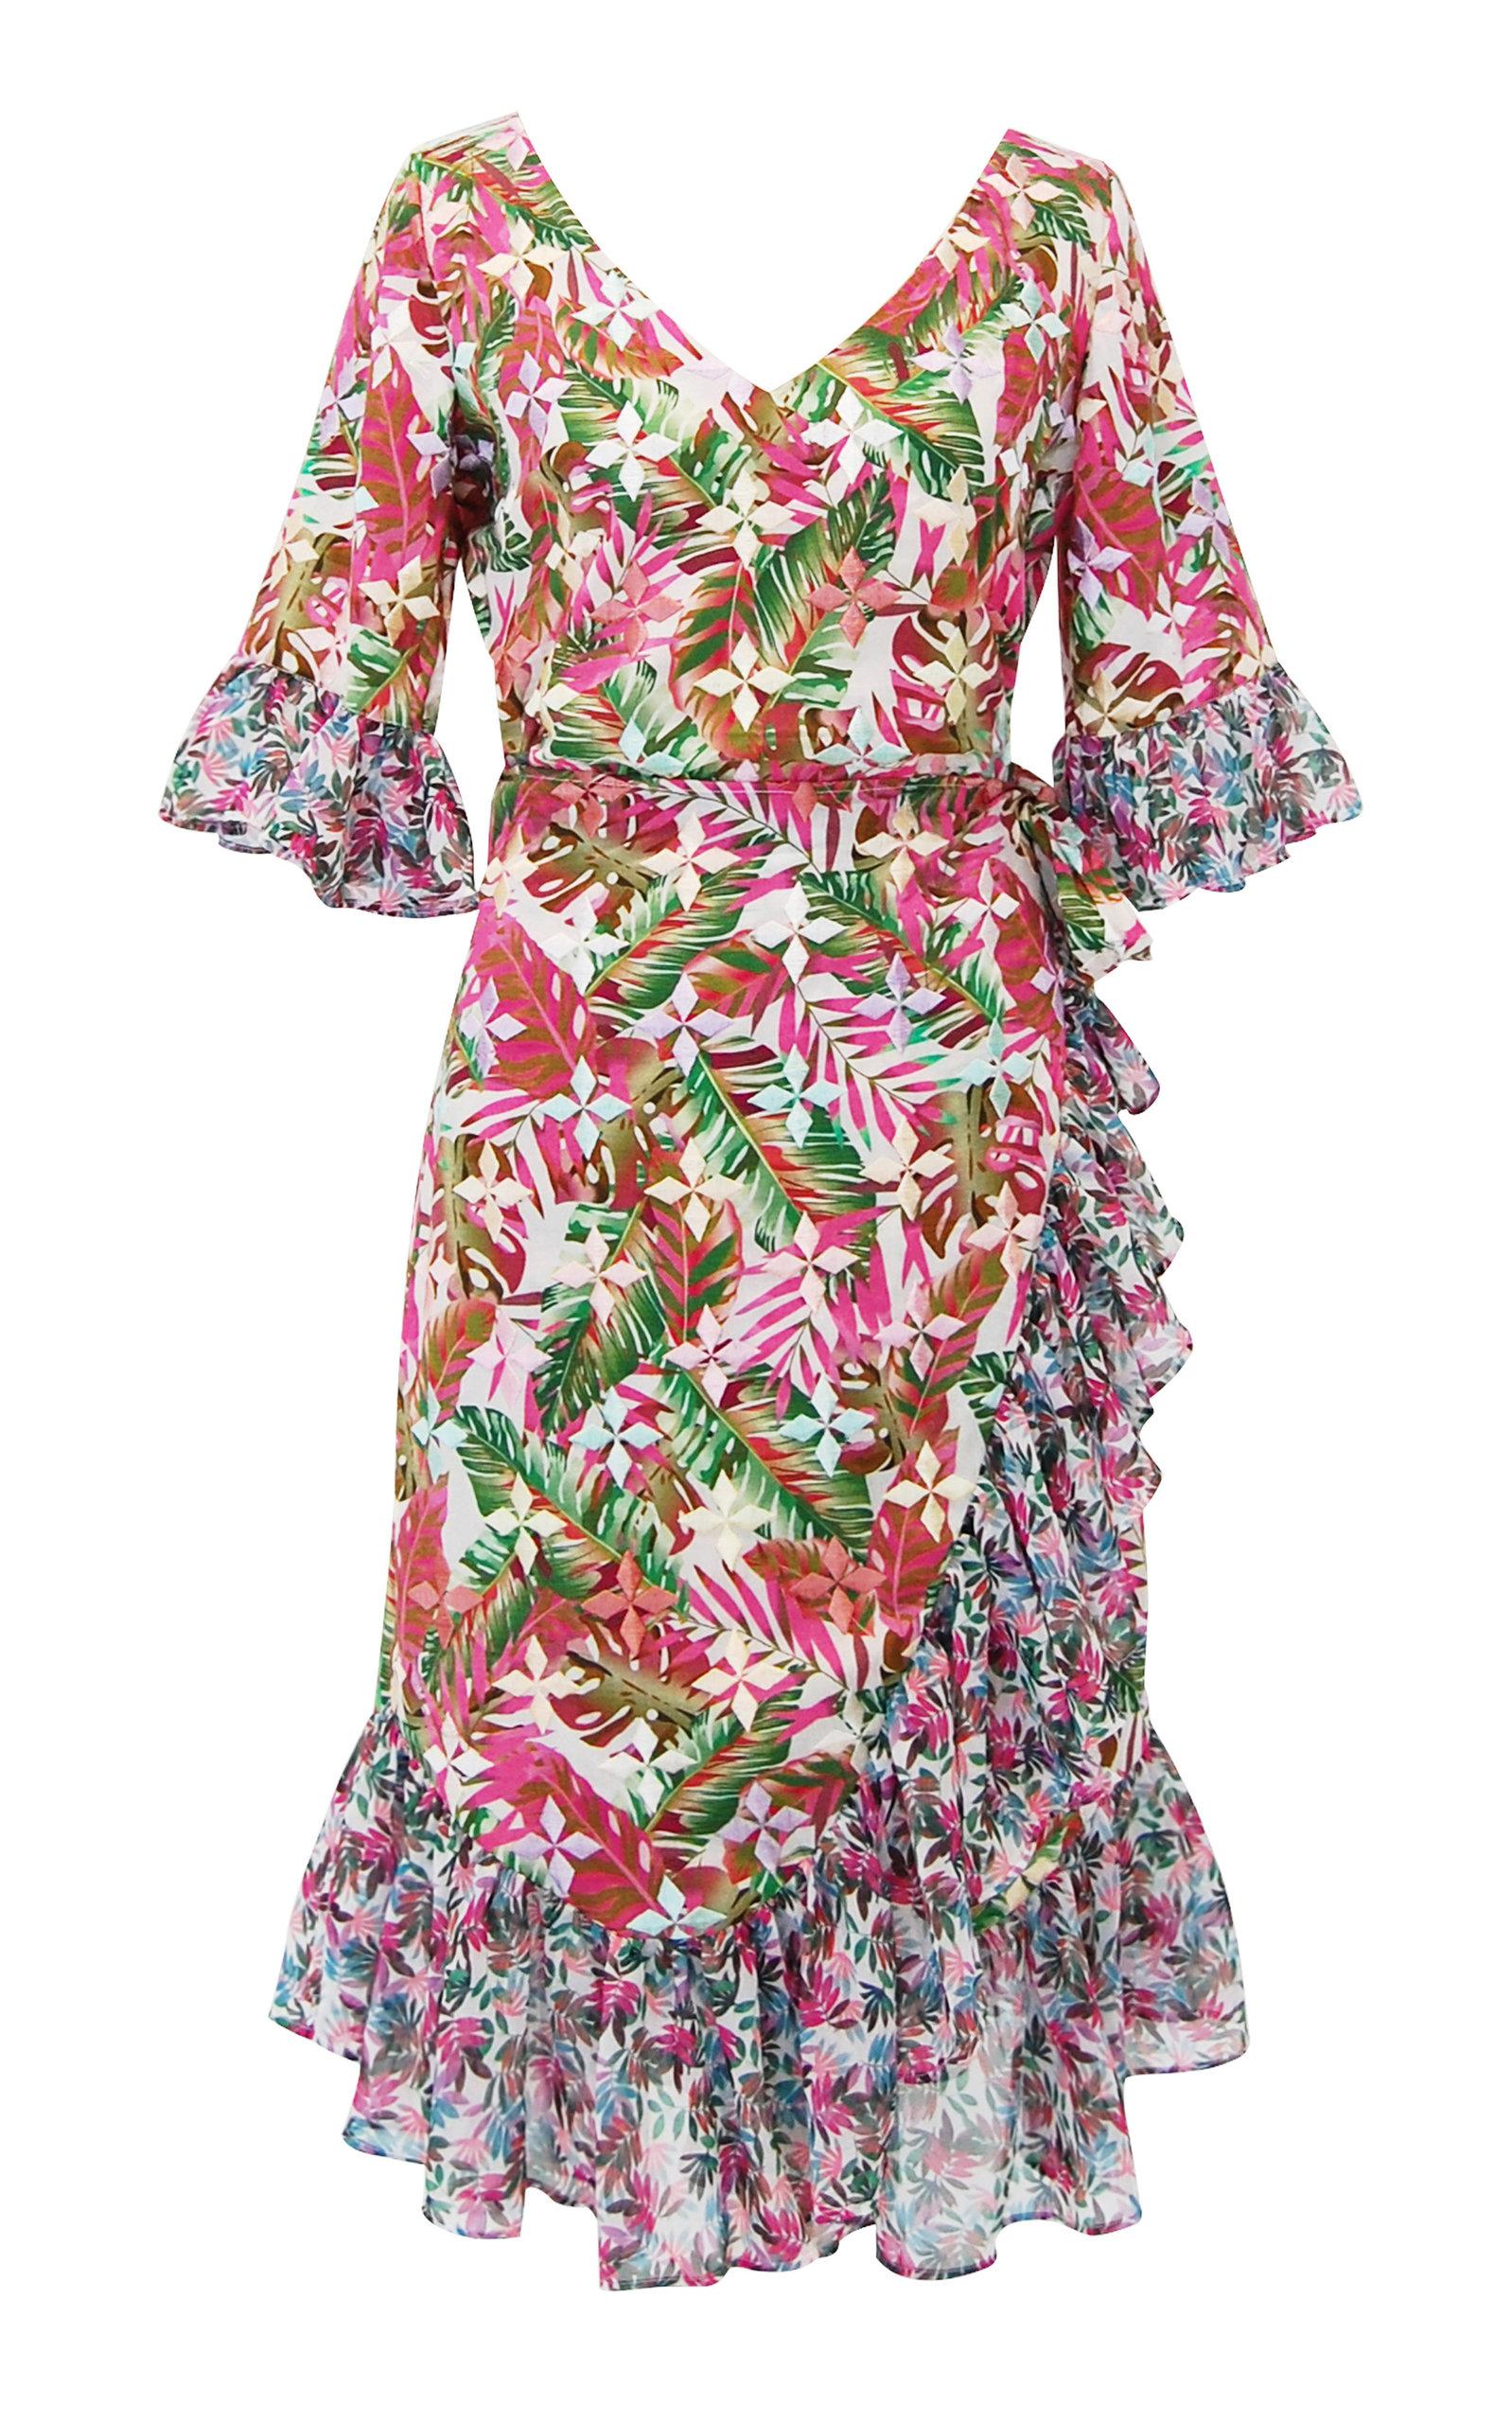 Philippa Ruffled Printed Linen Wrap Dress All Things Mochi 6XkP4